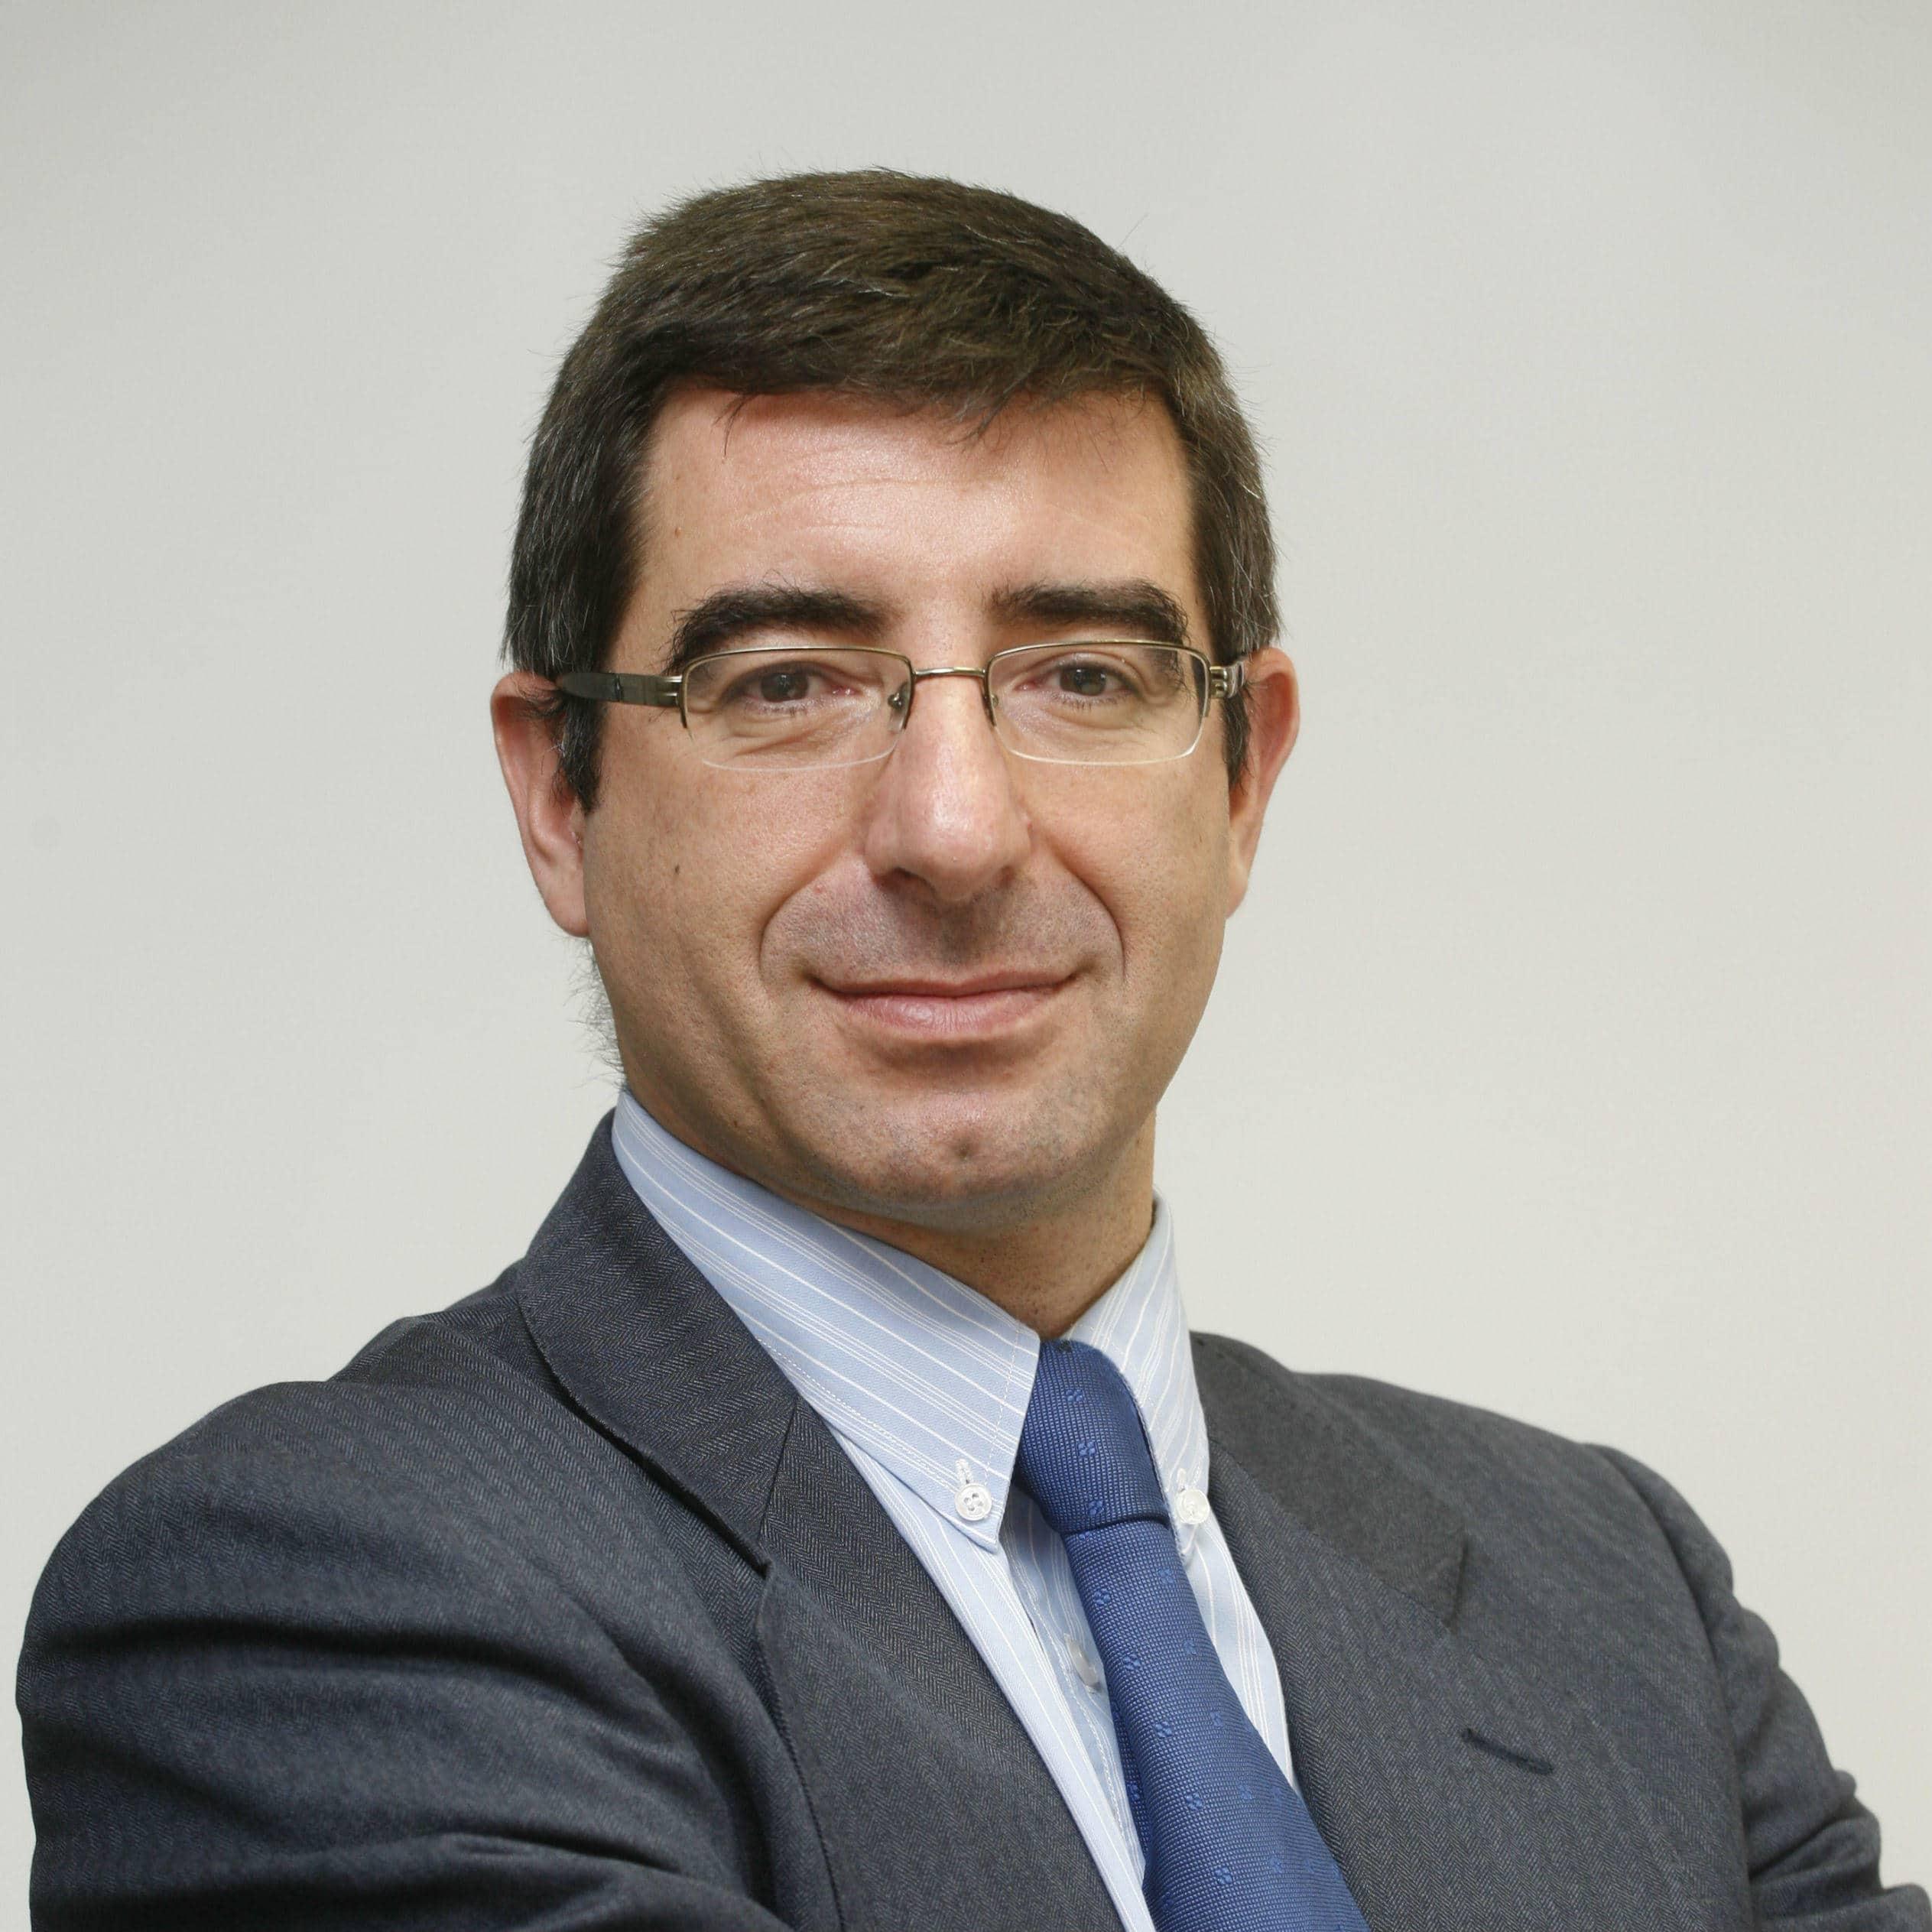 José Luis Bernal Zúñiga